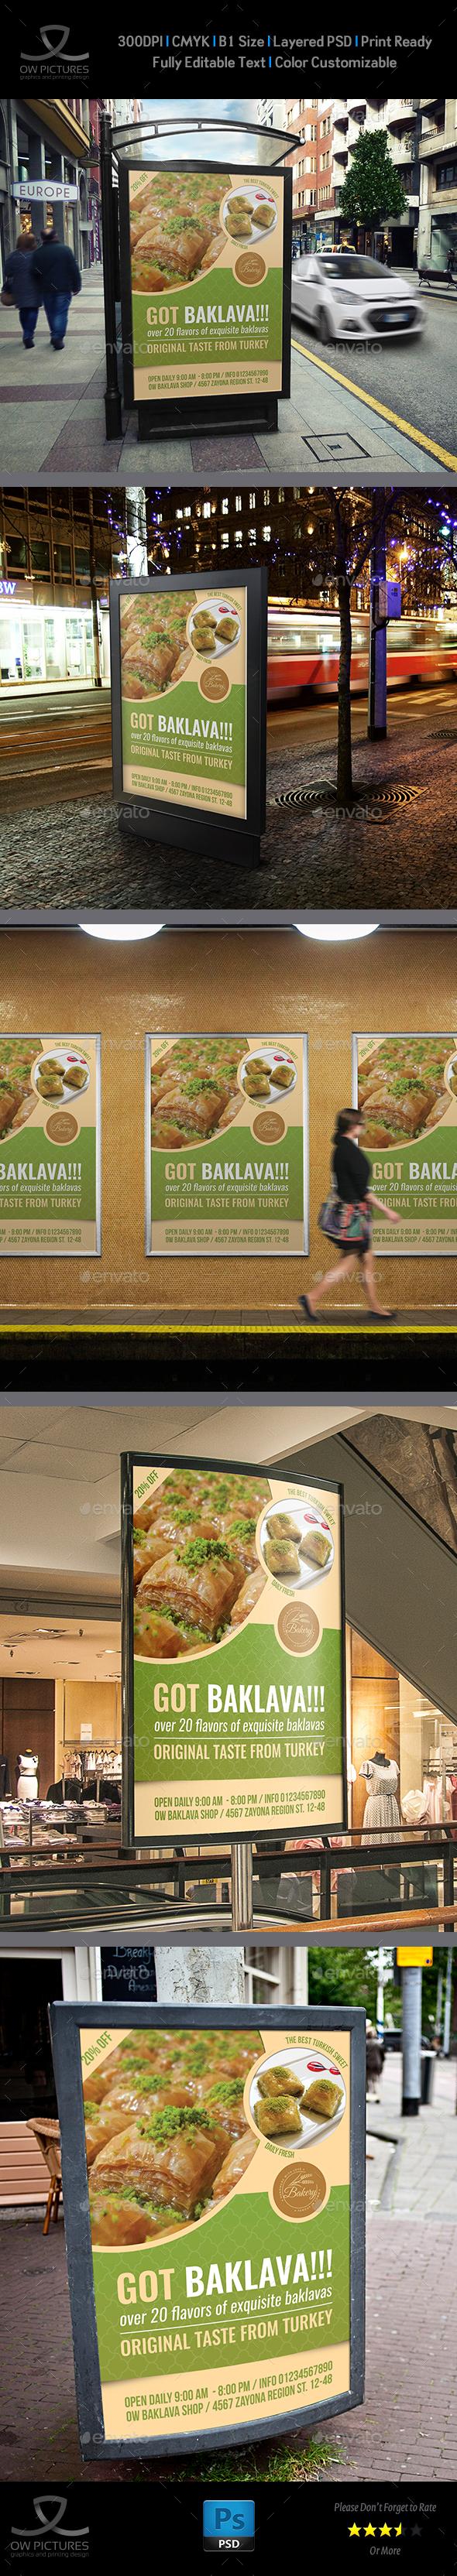 Baklava Poster Template - Signage Print Templates